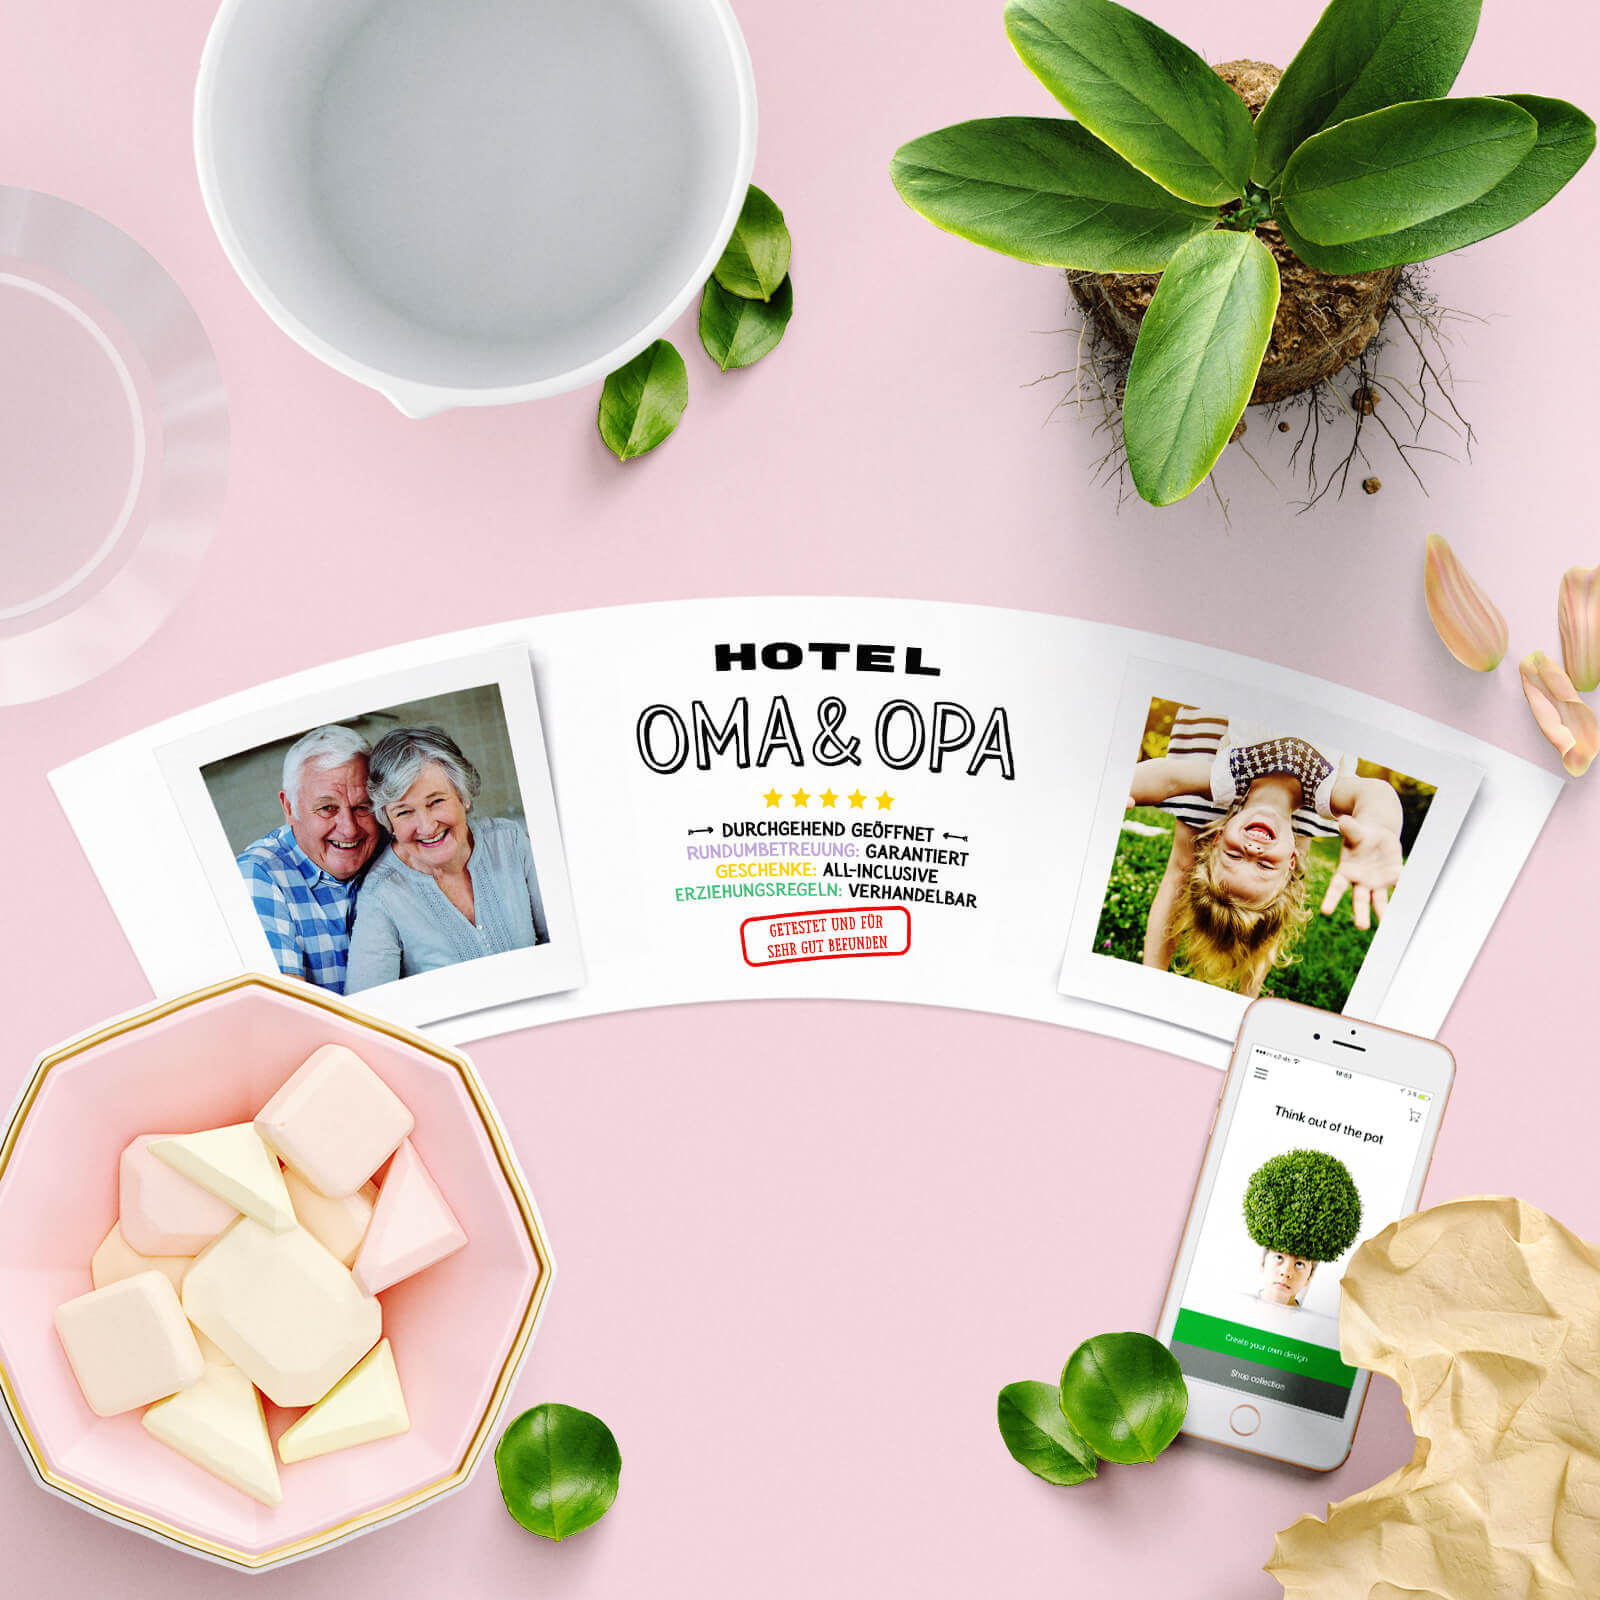 Top Hotel Oma & Opa – MyFacepot @SB_68